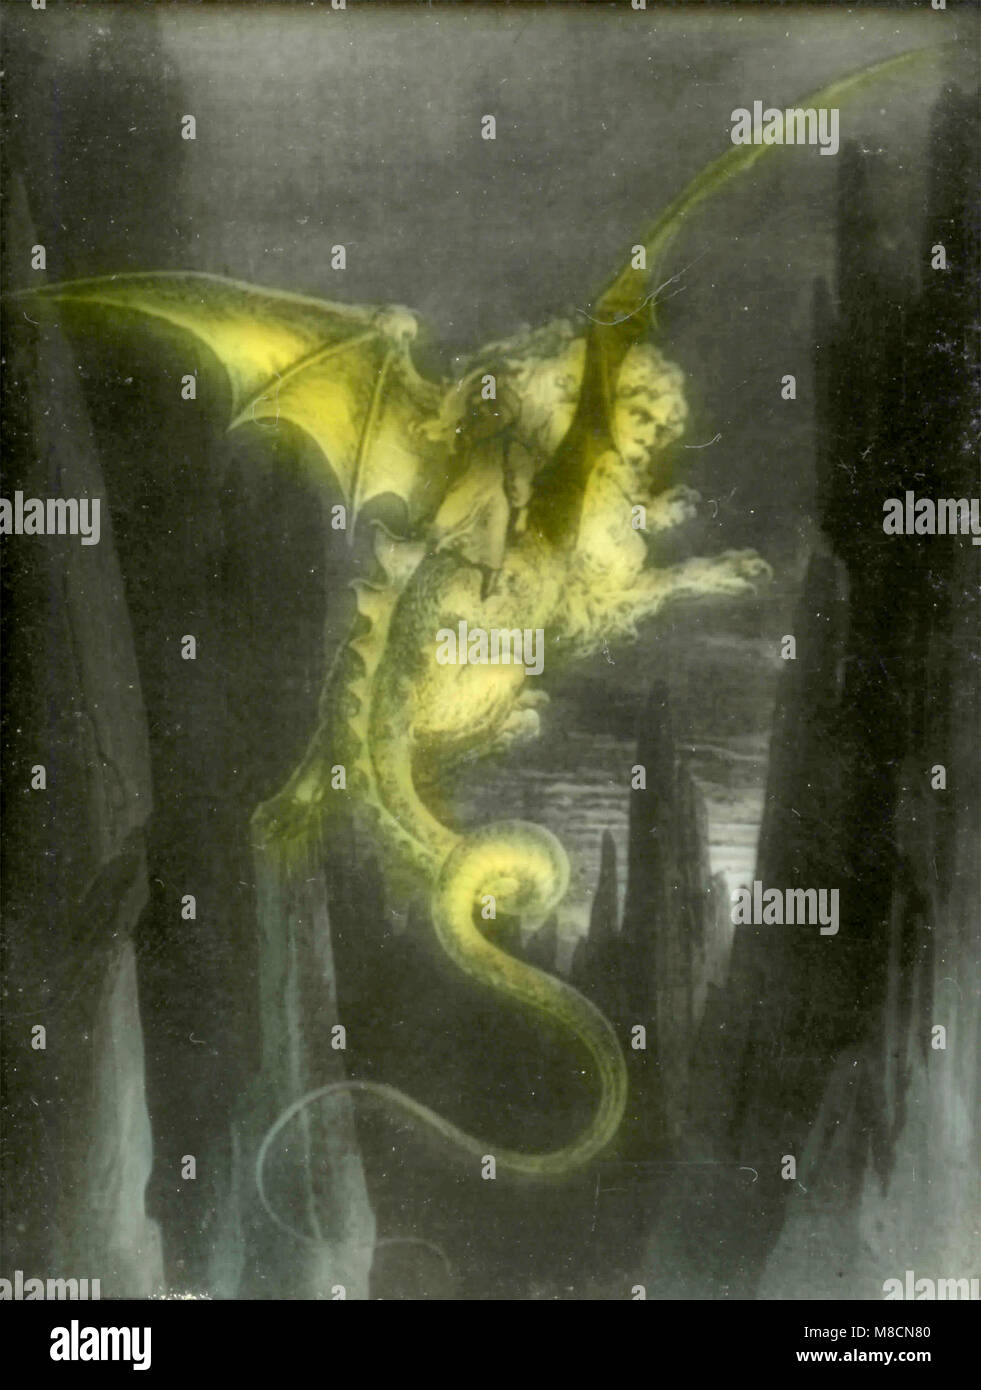 Canto XVII (17), Geryon, Dante's Inferno illustration by Dorè - Stock Image